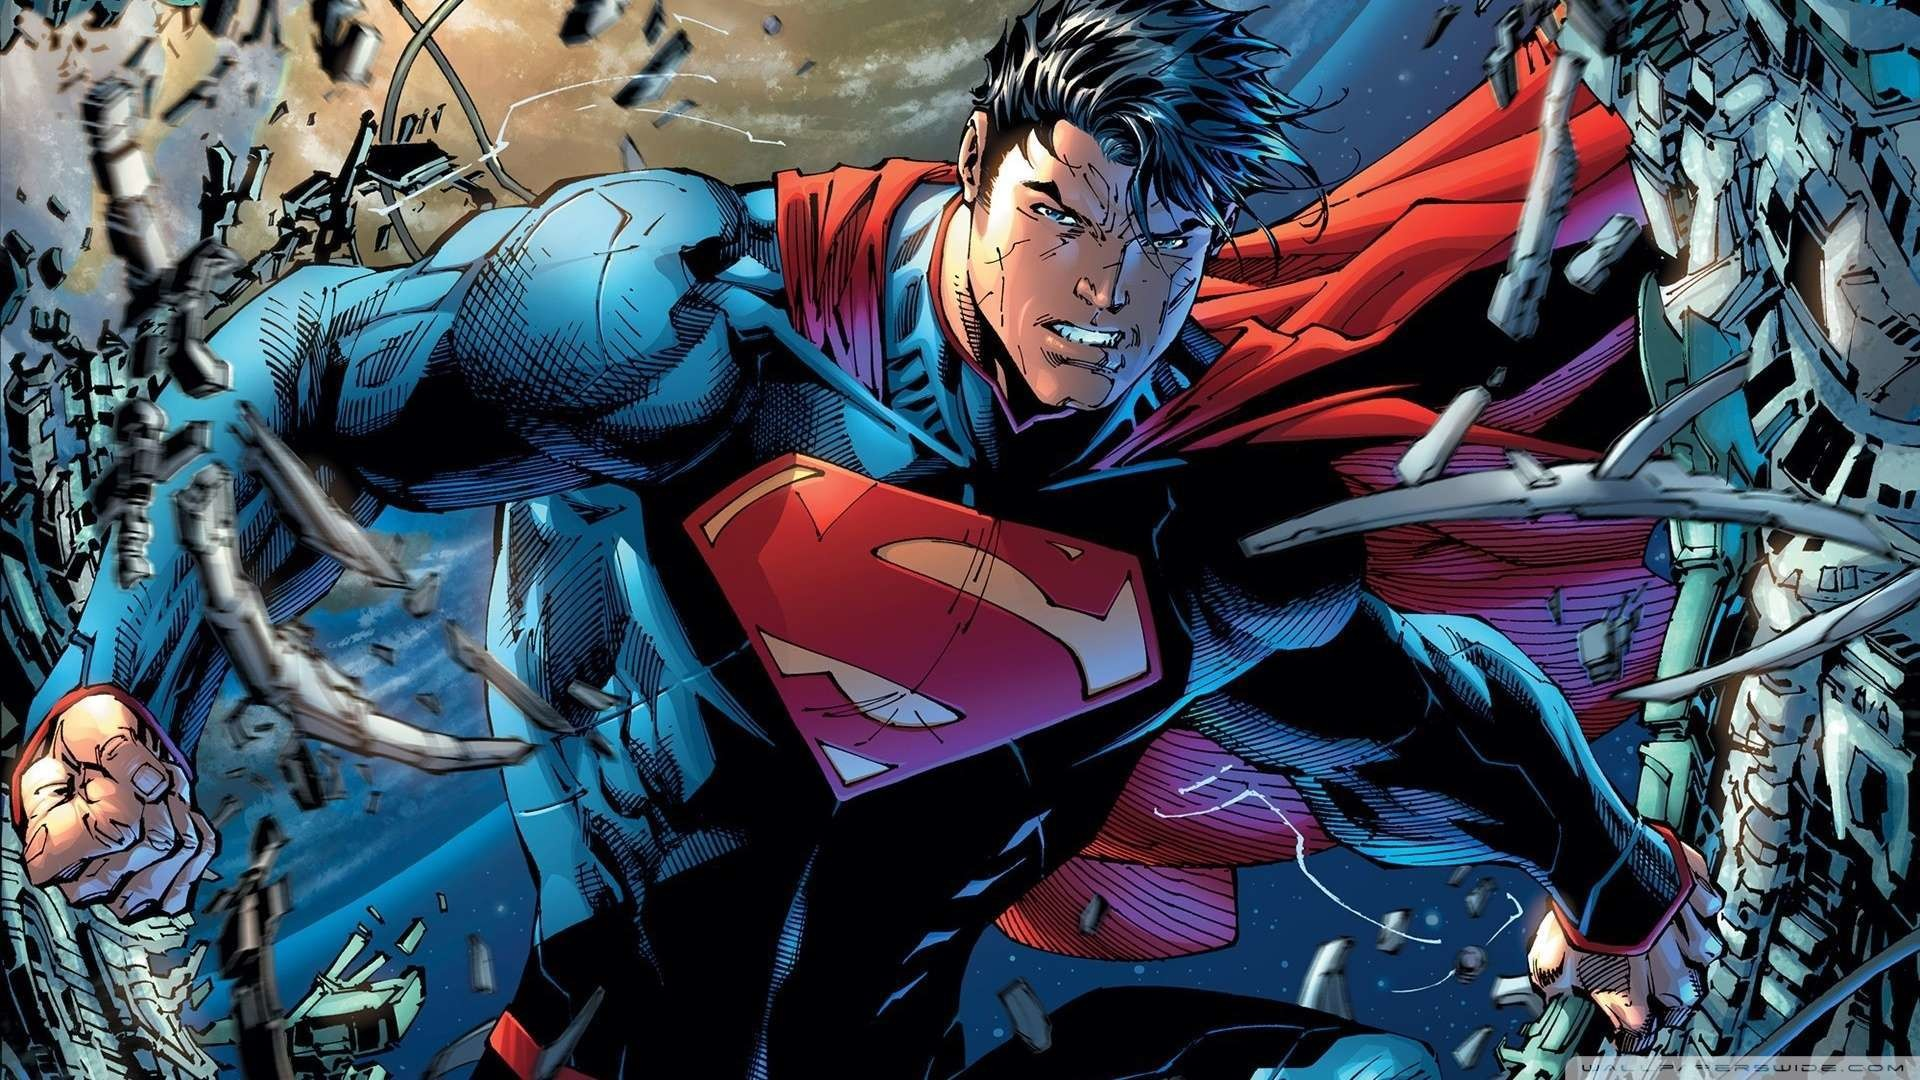 Superman Wallpaper 1080p